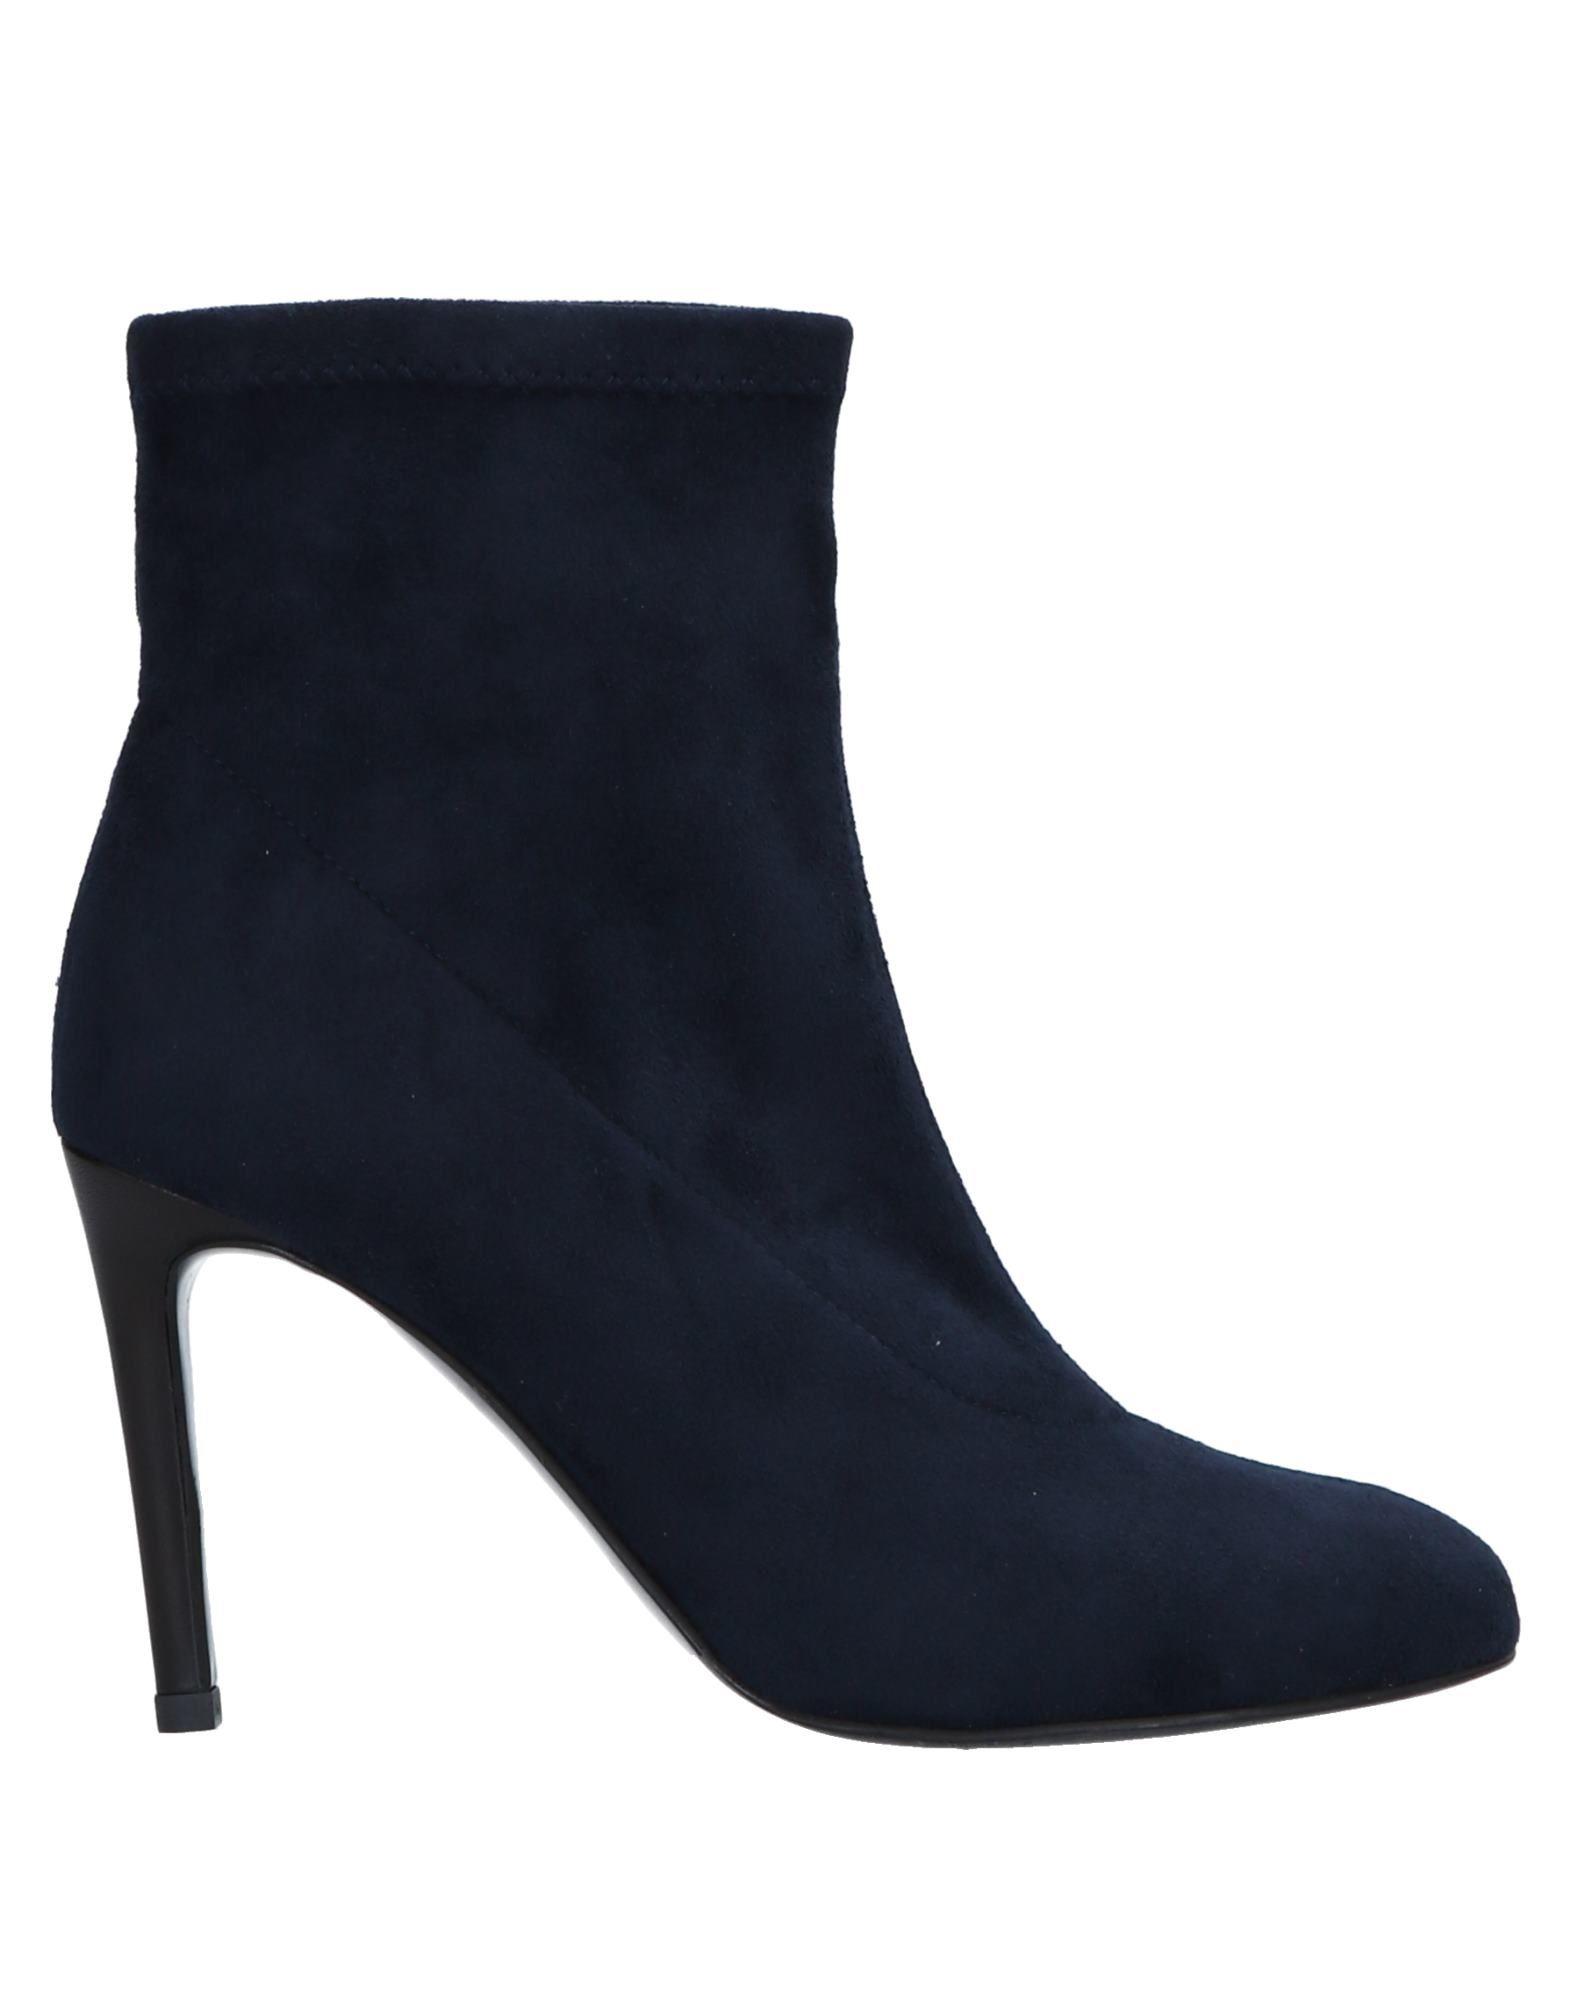 GIANNI MARRA Ankle Boot in Dark Blue